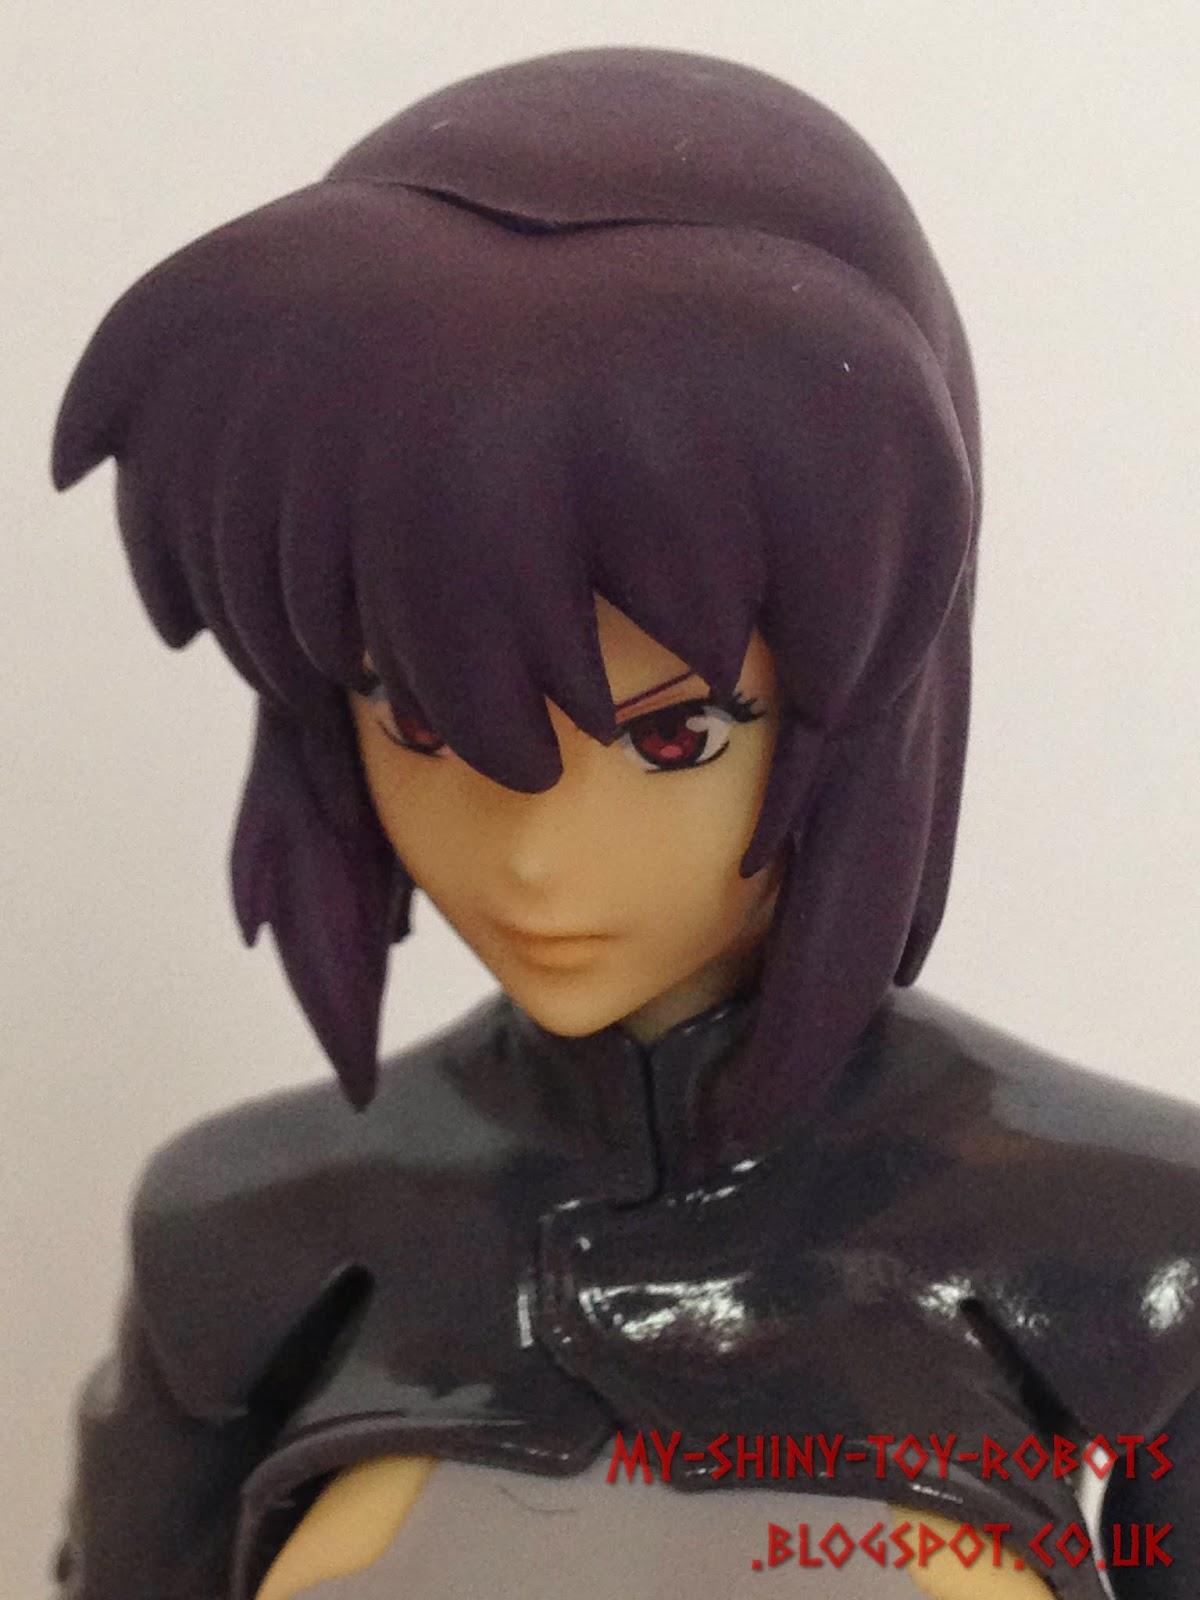 Figma Motoko Kusanagi S.A.C. Ver.